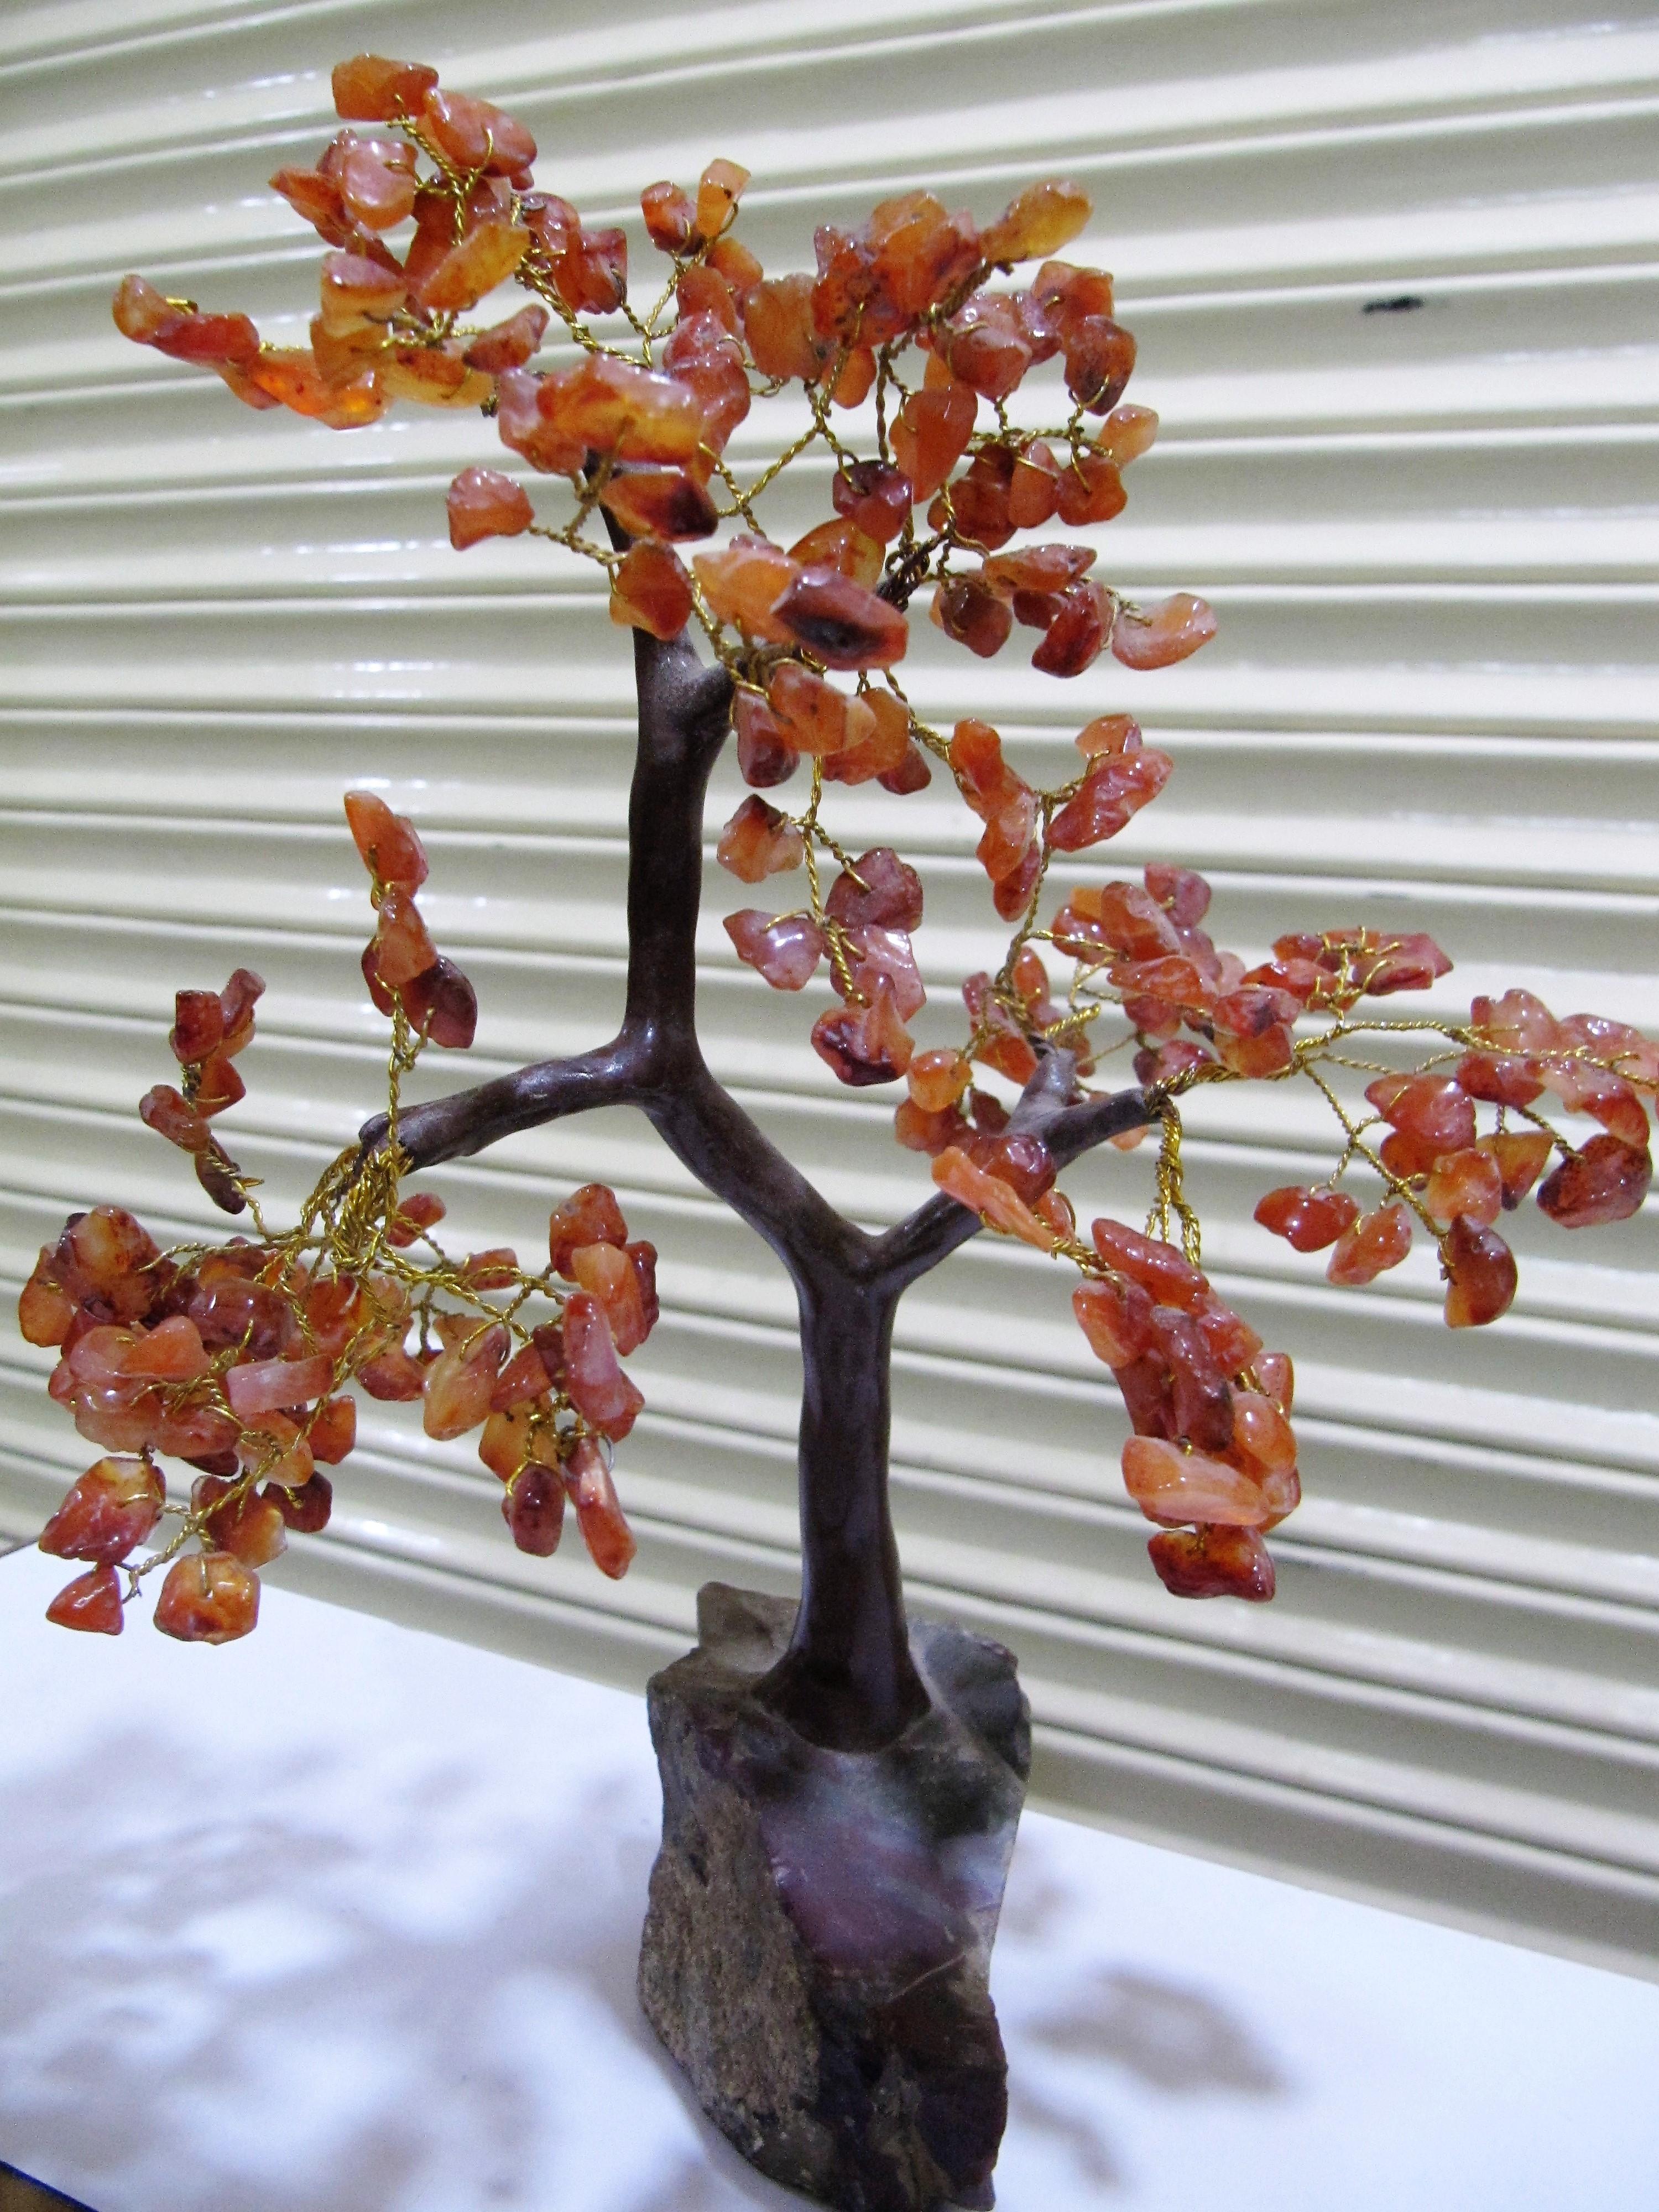 Harmonize Carnelian Stone Healing Stone Tree Spritual Table Decor Office Gift 6-7 inches Long.